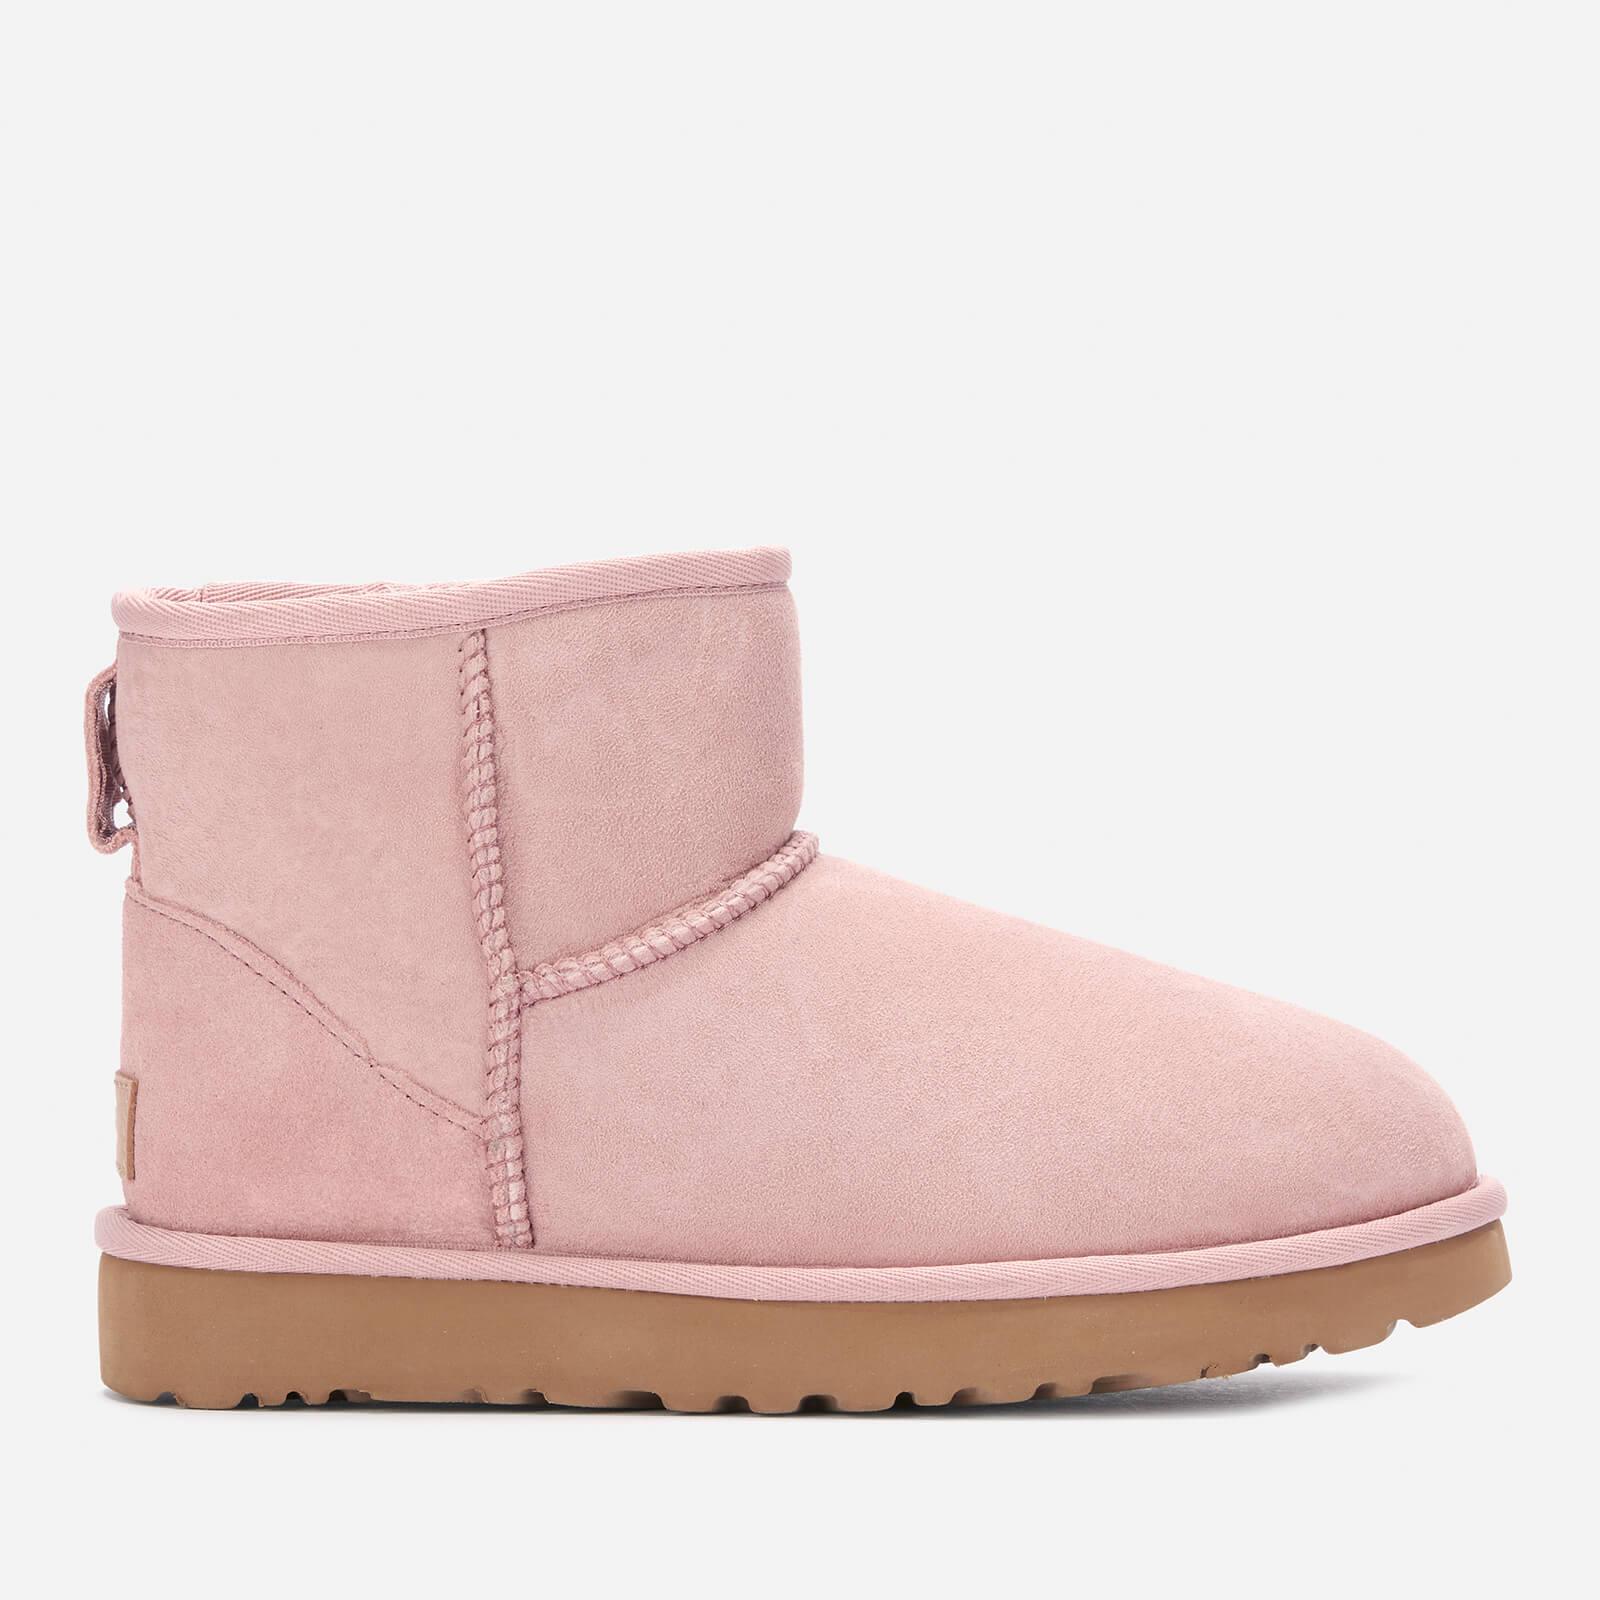 UGG Women's Classic Mini II Sheepskin Boots - Pink Crystal - UK 6